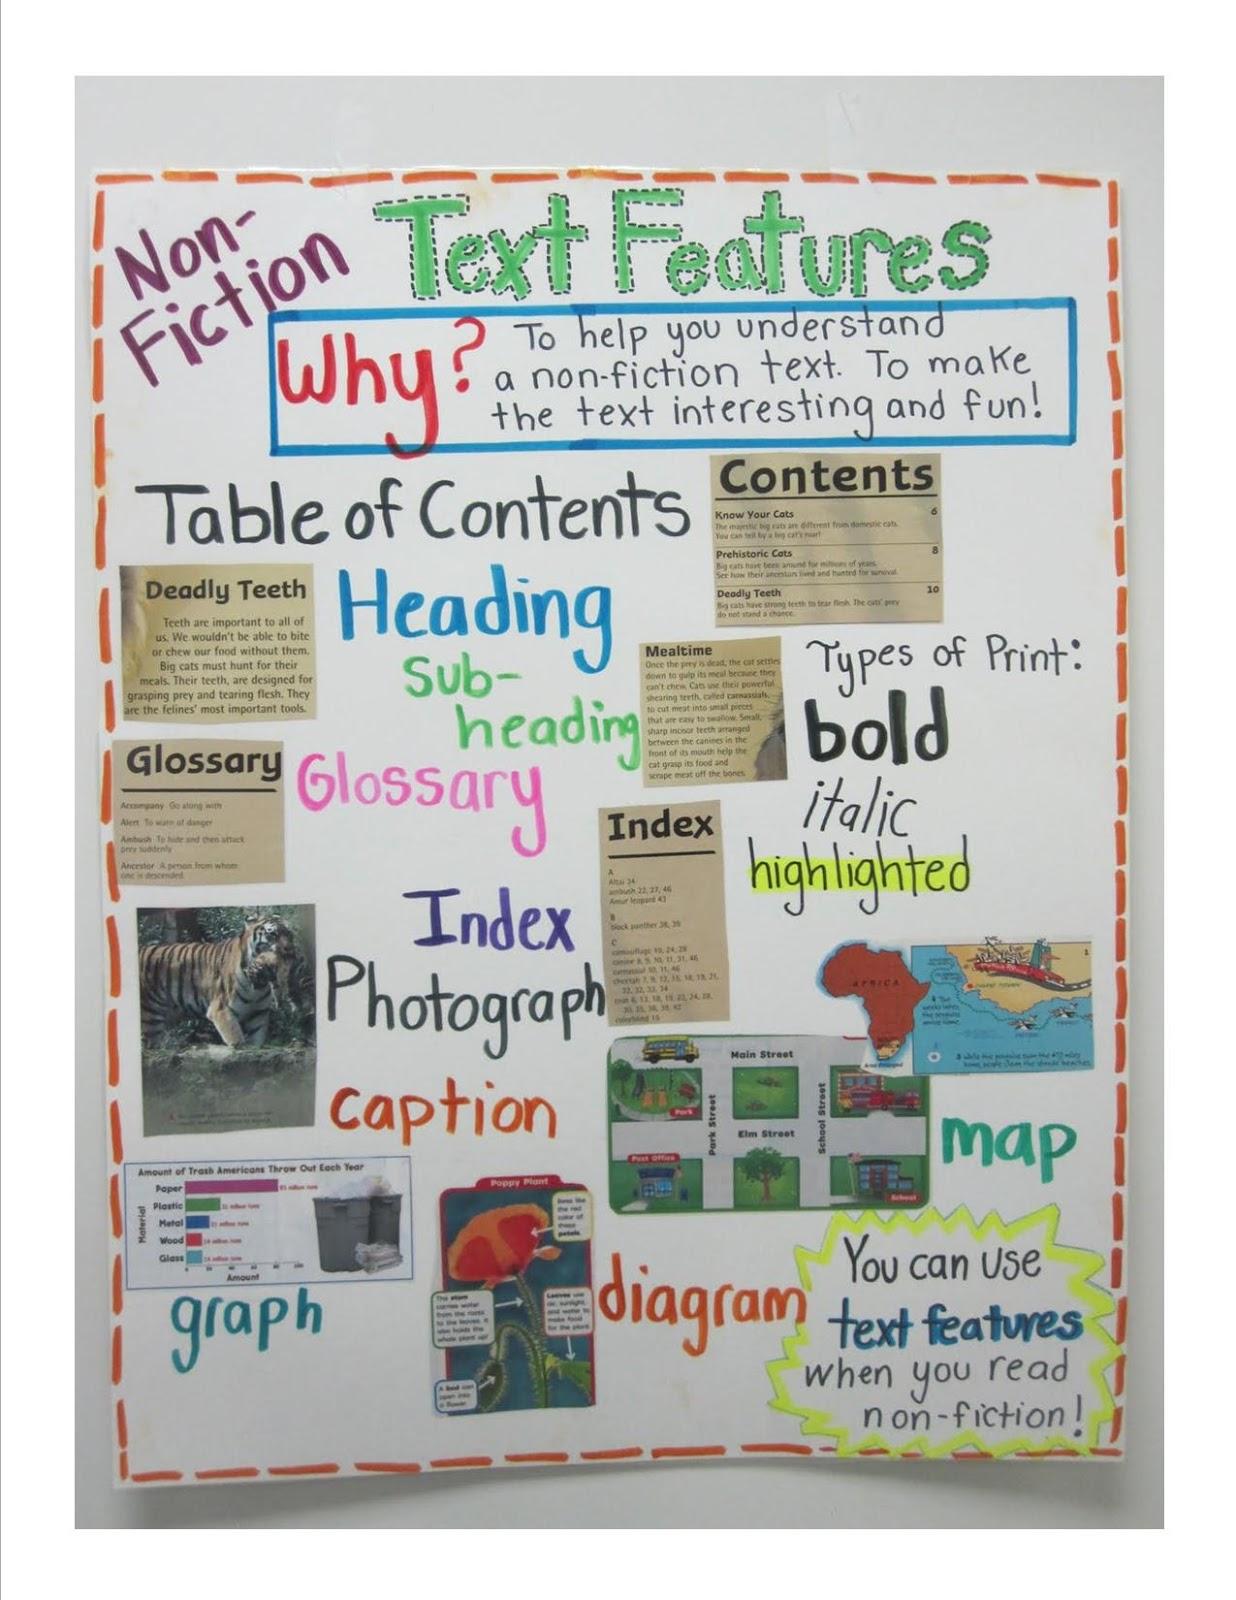 Learning about non fiction text features also jennifer   teaching tools rh jennifersteachingtoolsspot